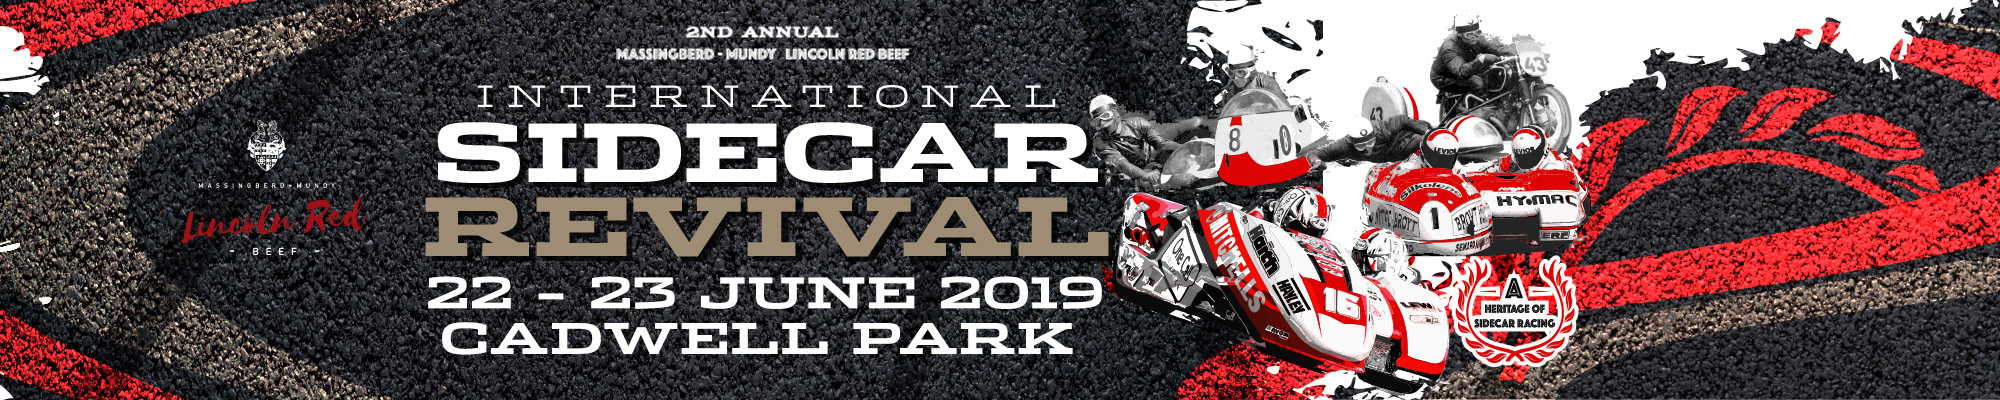 International Sidecar Revival